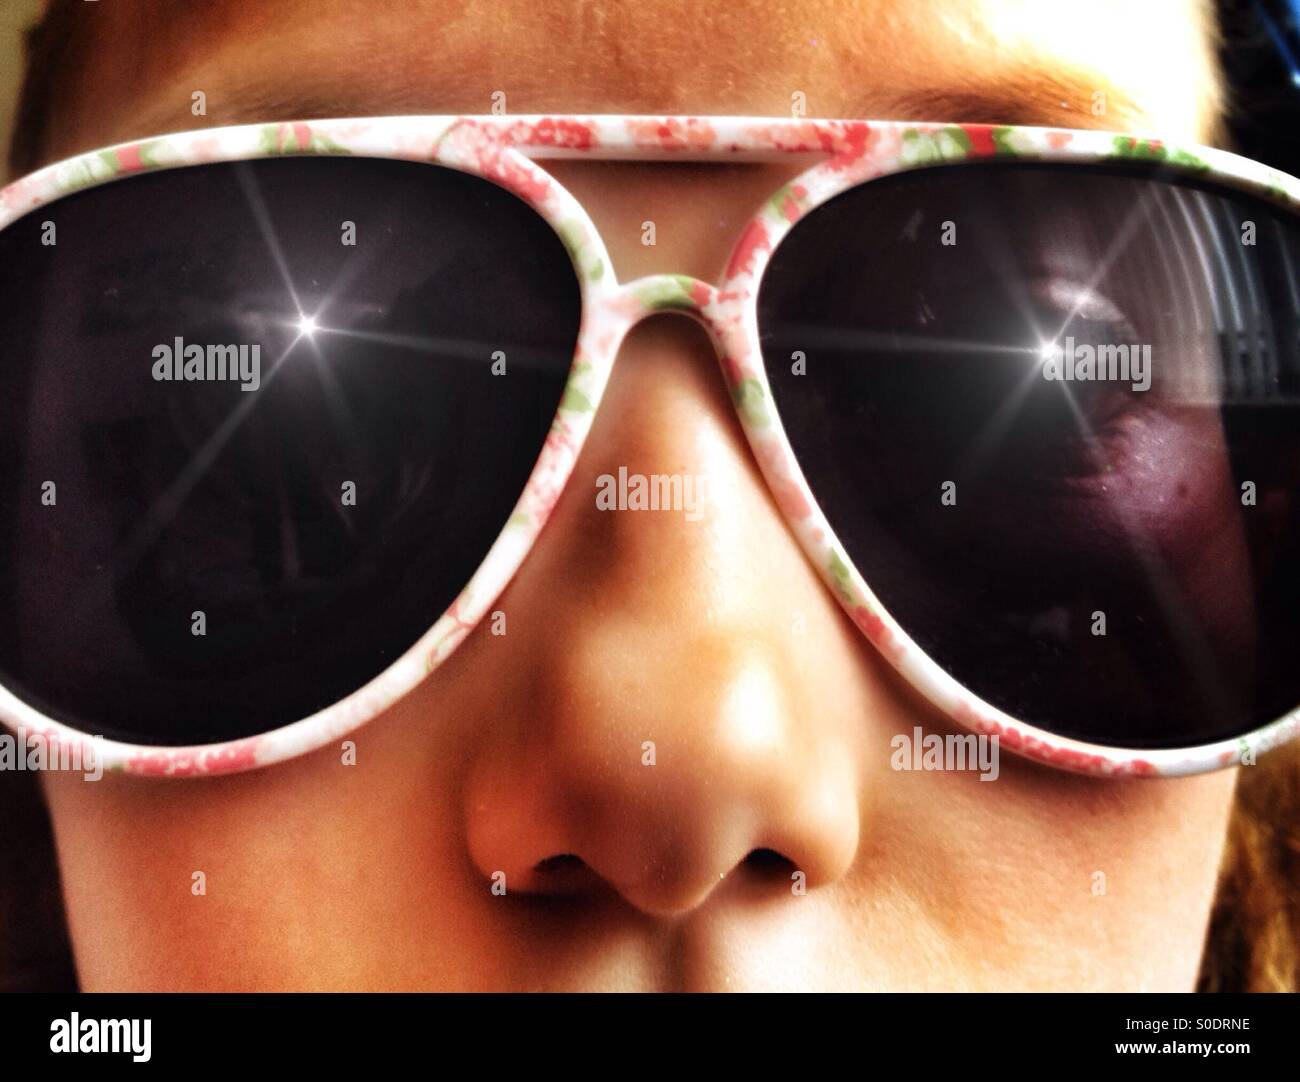 Joven llevaba gafas de sol oscuras Imagen De Stock